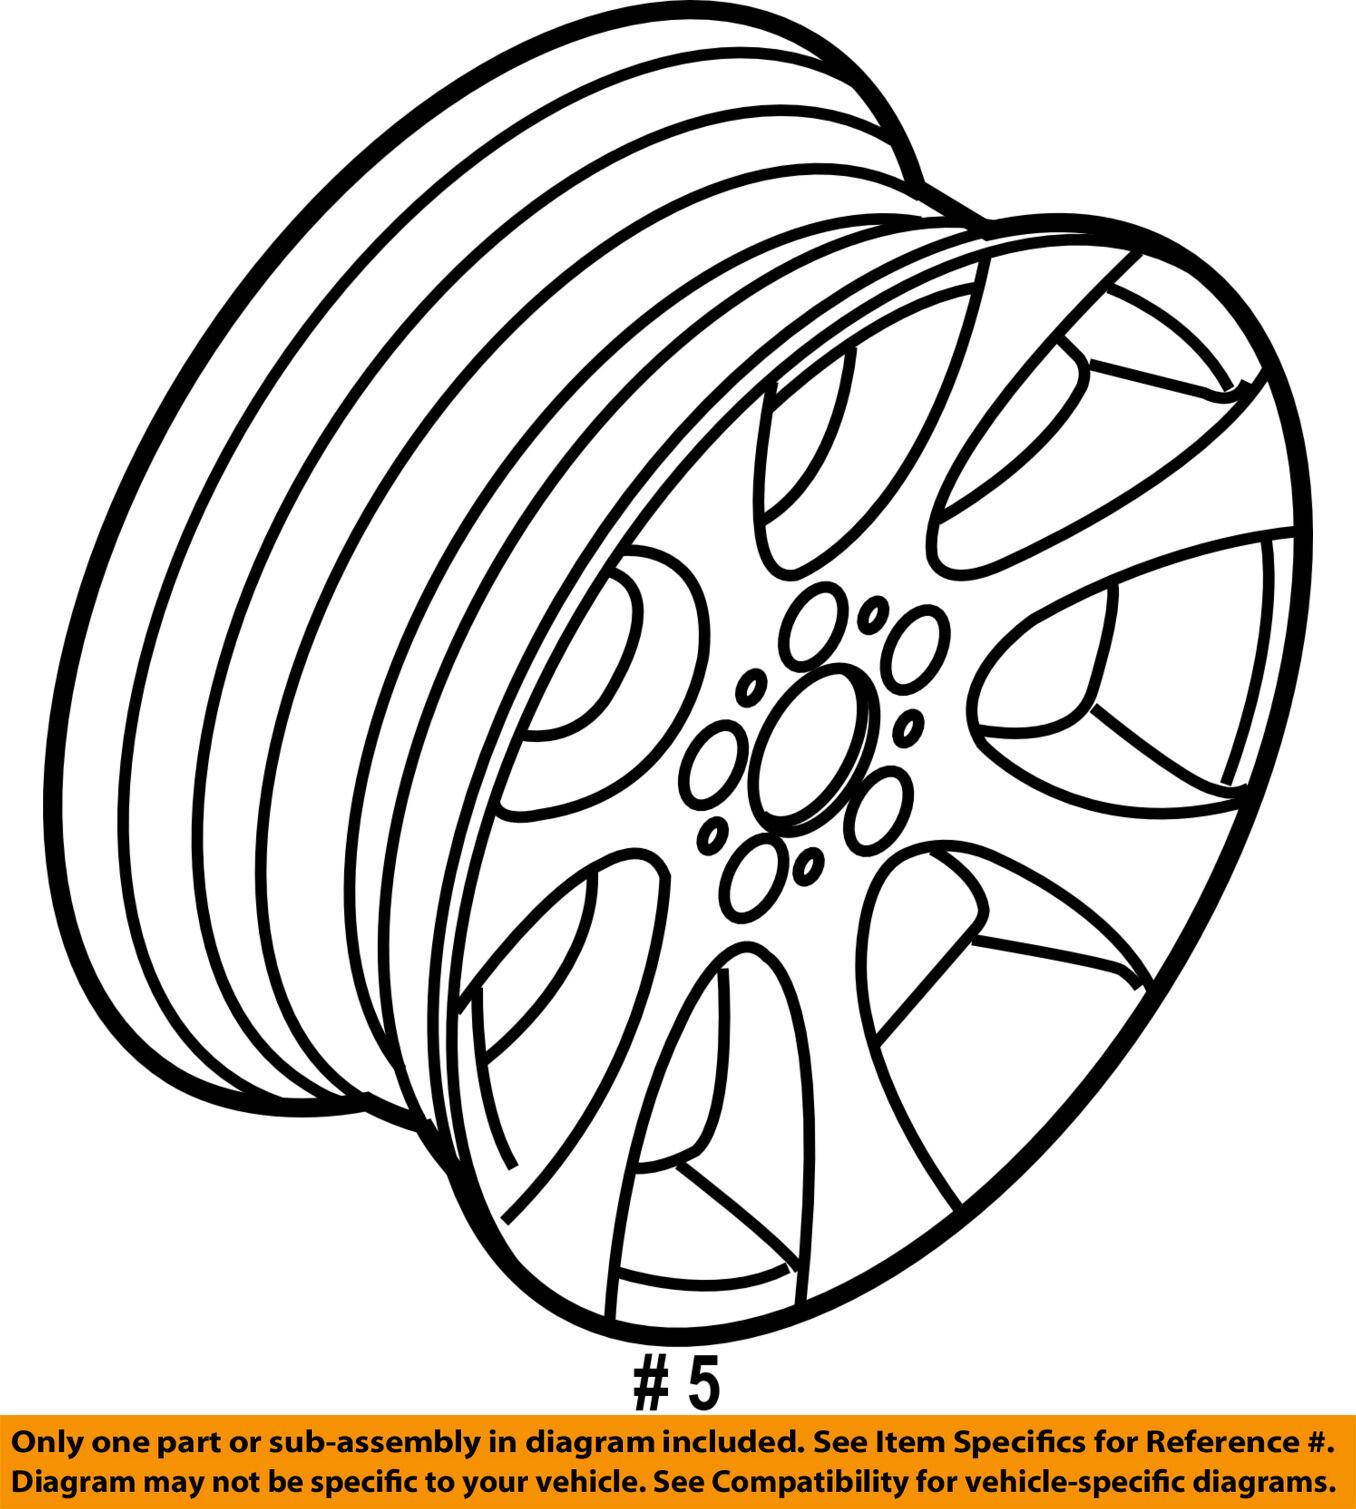 2006 bmw 330i fuse diagram wiring diagram database Scion Fuse Box 2006 bmw 325i diagram wiring diagram database 2006 bmw fuse box diagram 2006 bmw 325i red